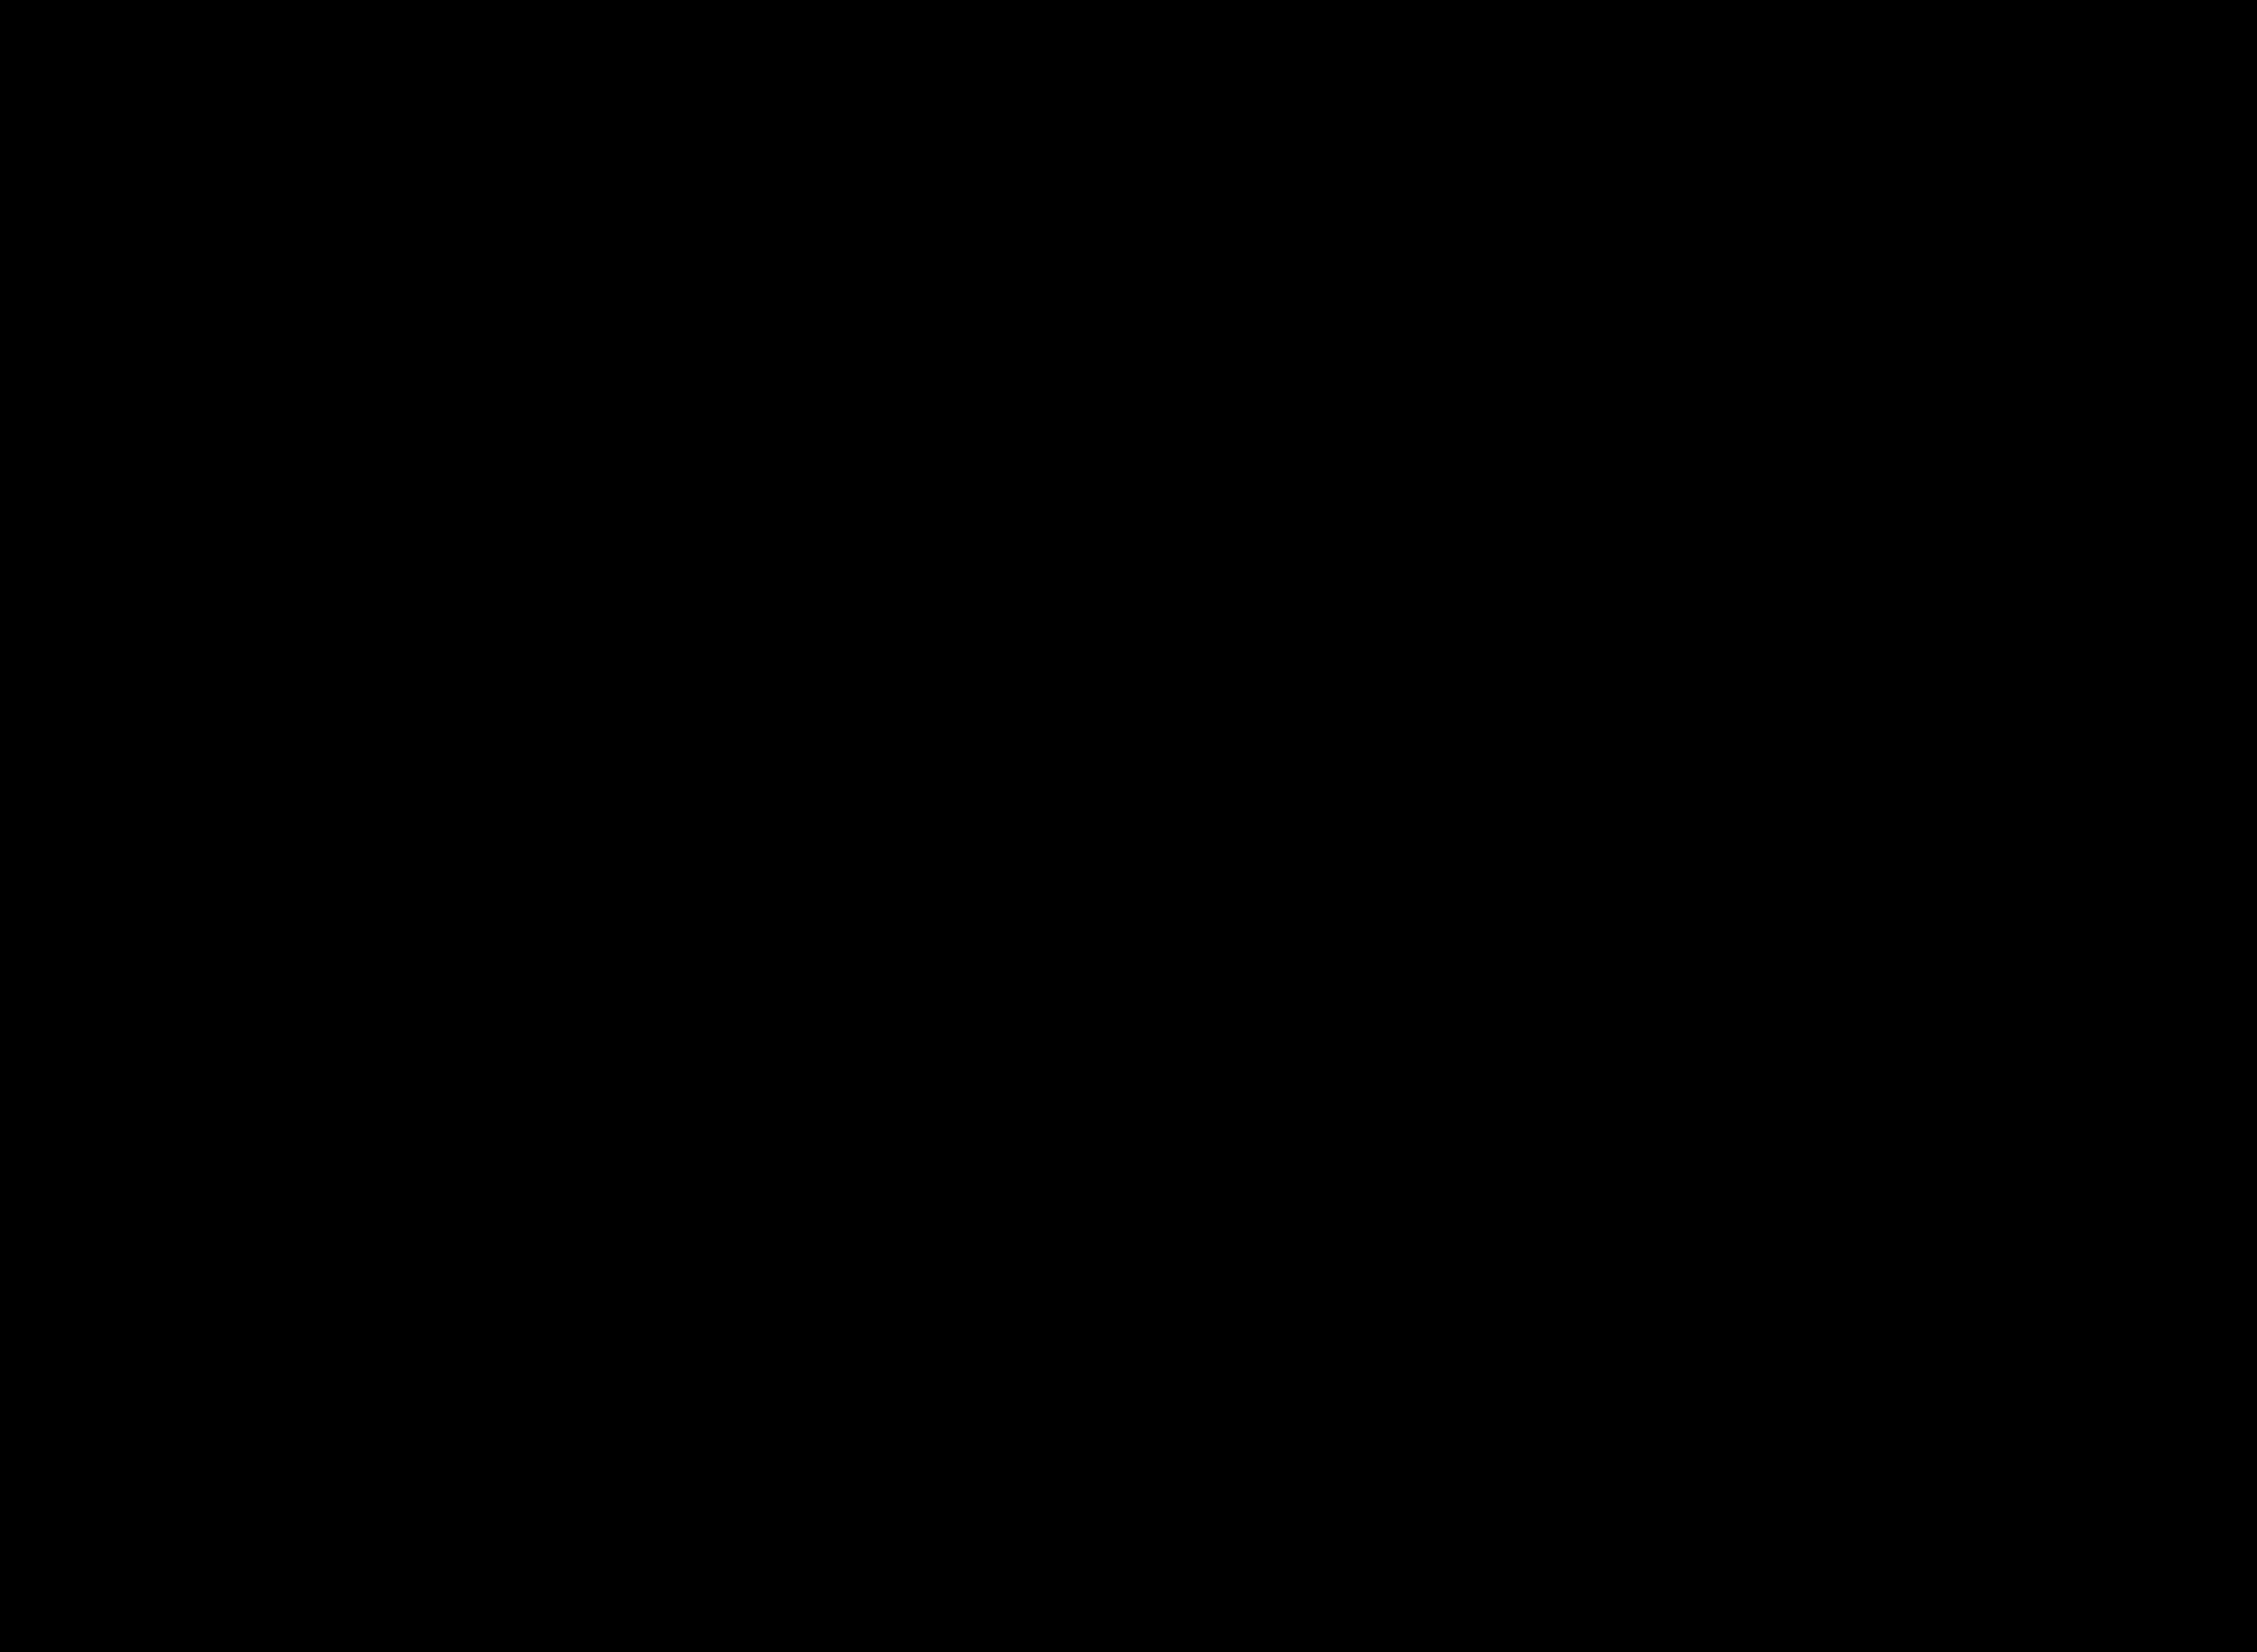 _2BP0596_A